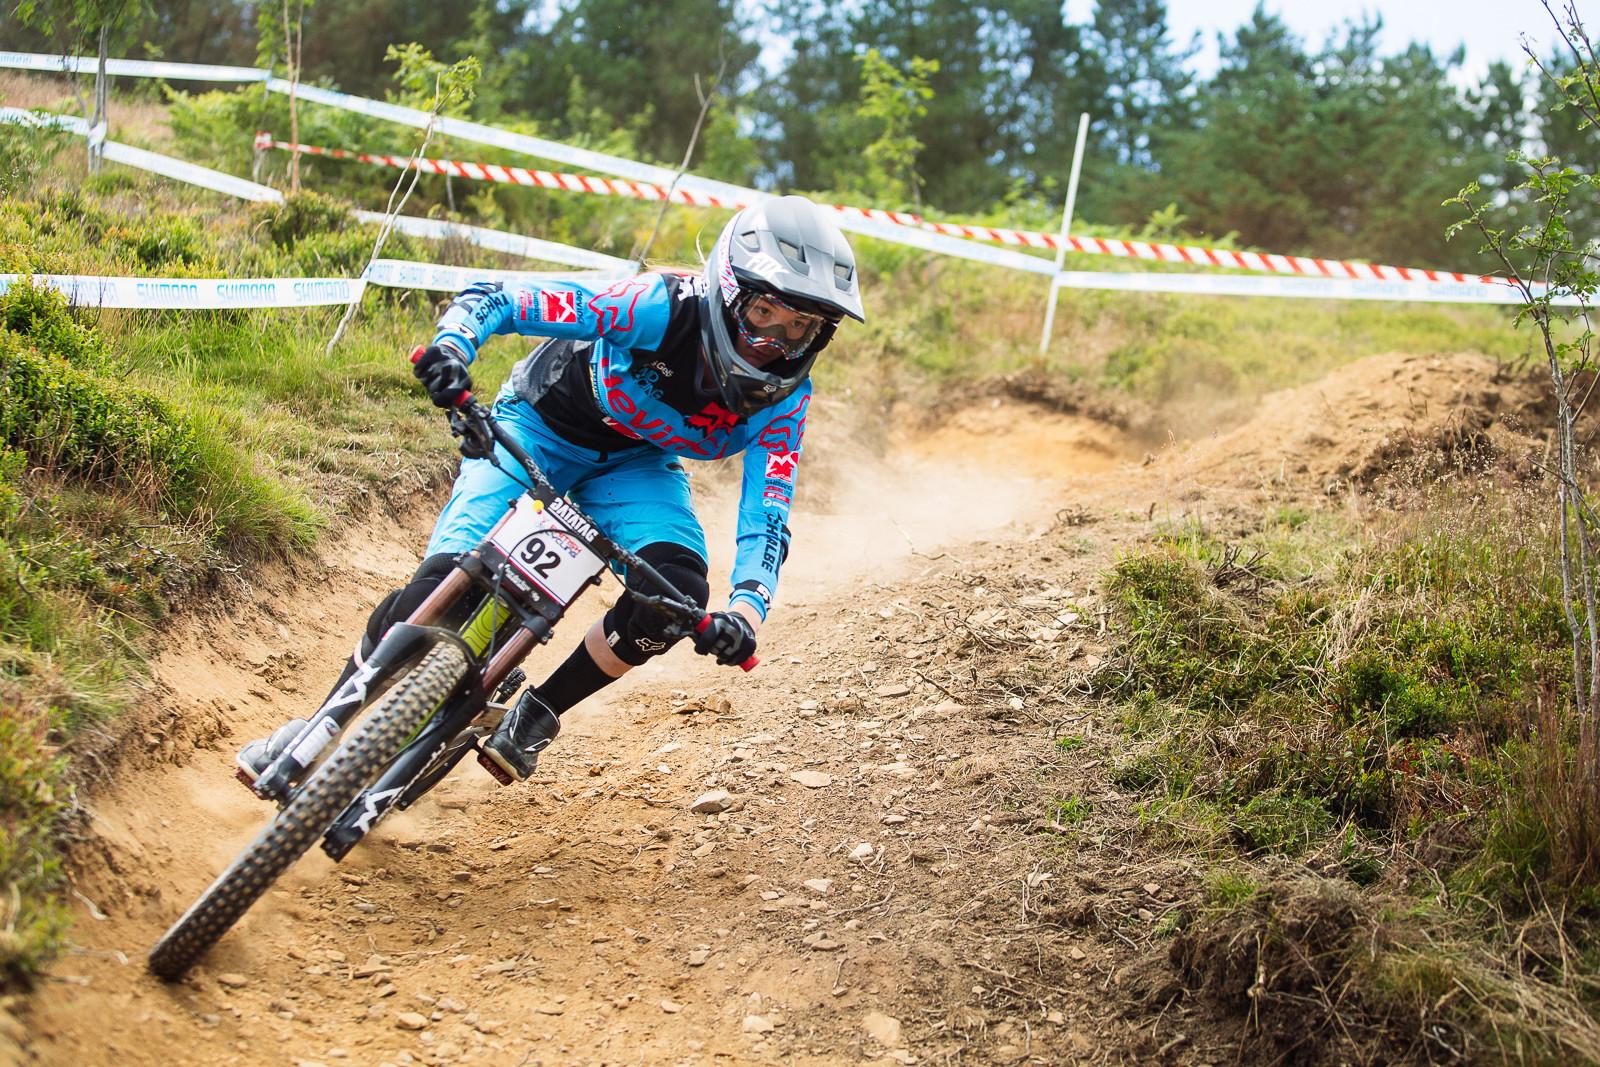 Tahnee Seagrave - 2015 British National Champs Downhill - 2015 British National Champs Downhill Photos - Mountain Biking Pictures - Vital MTB